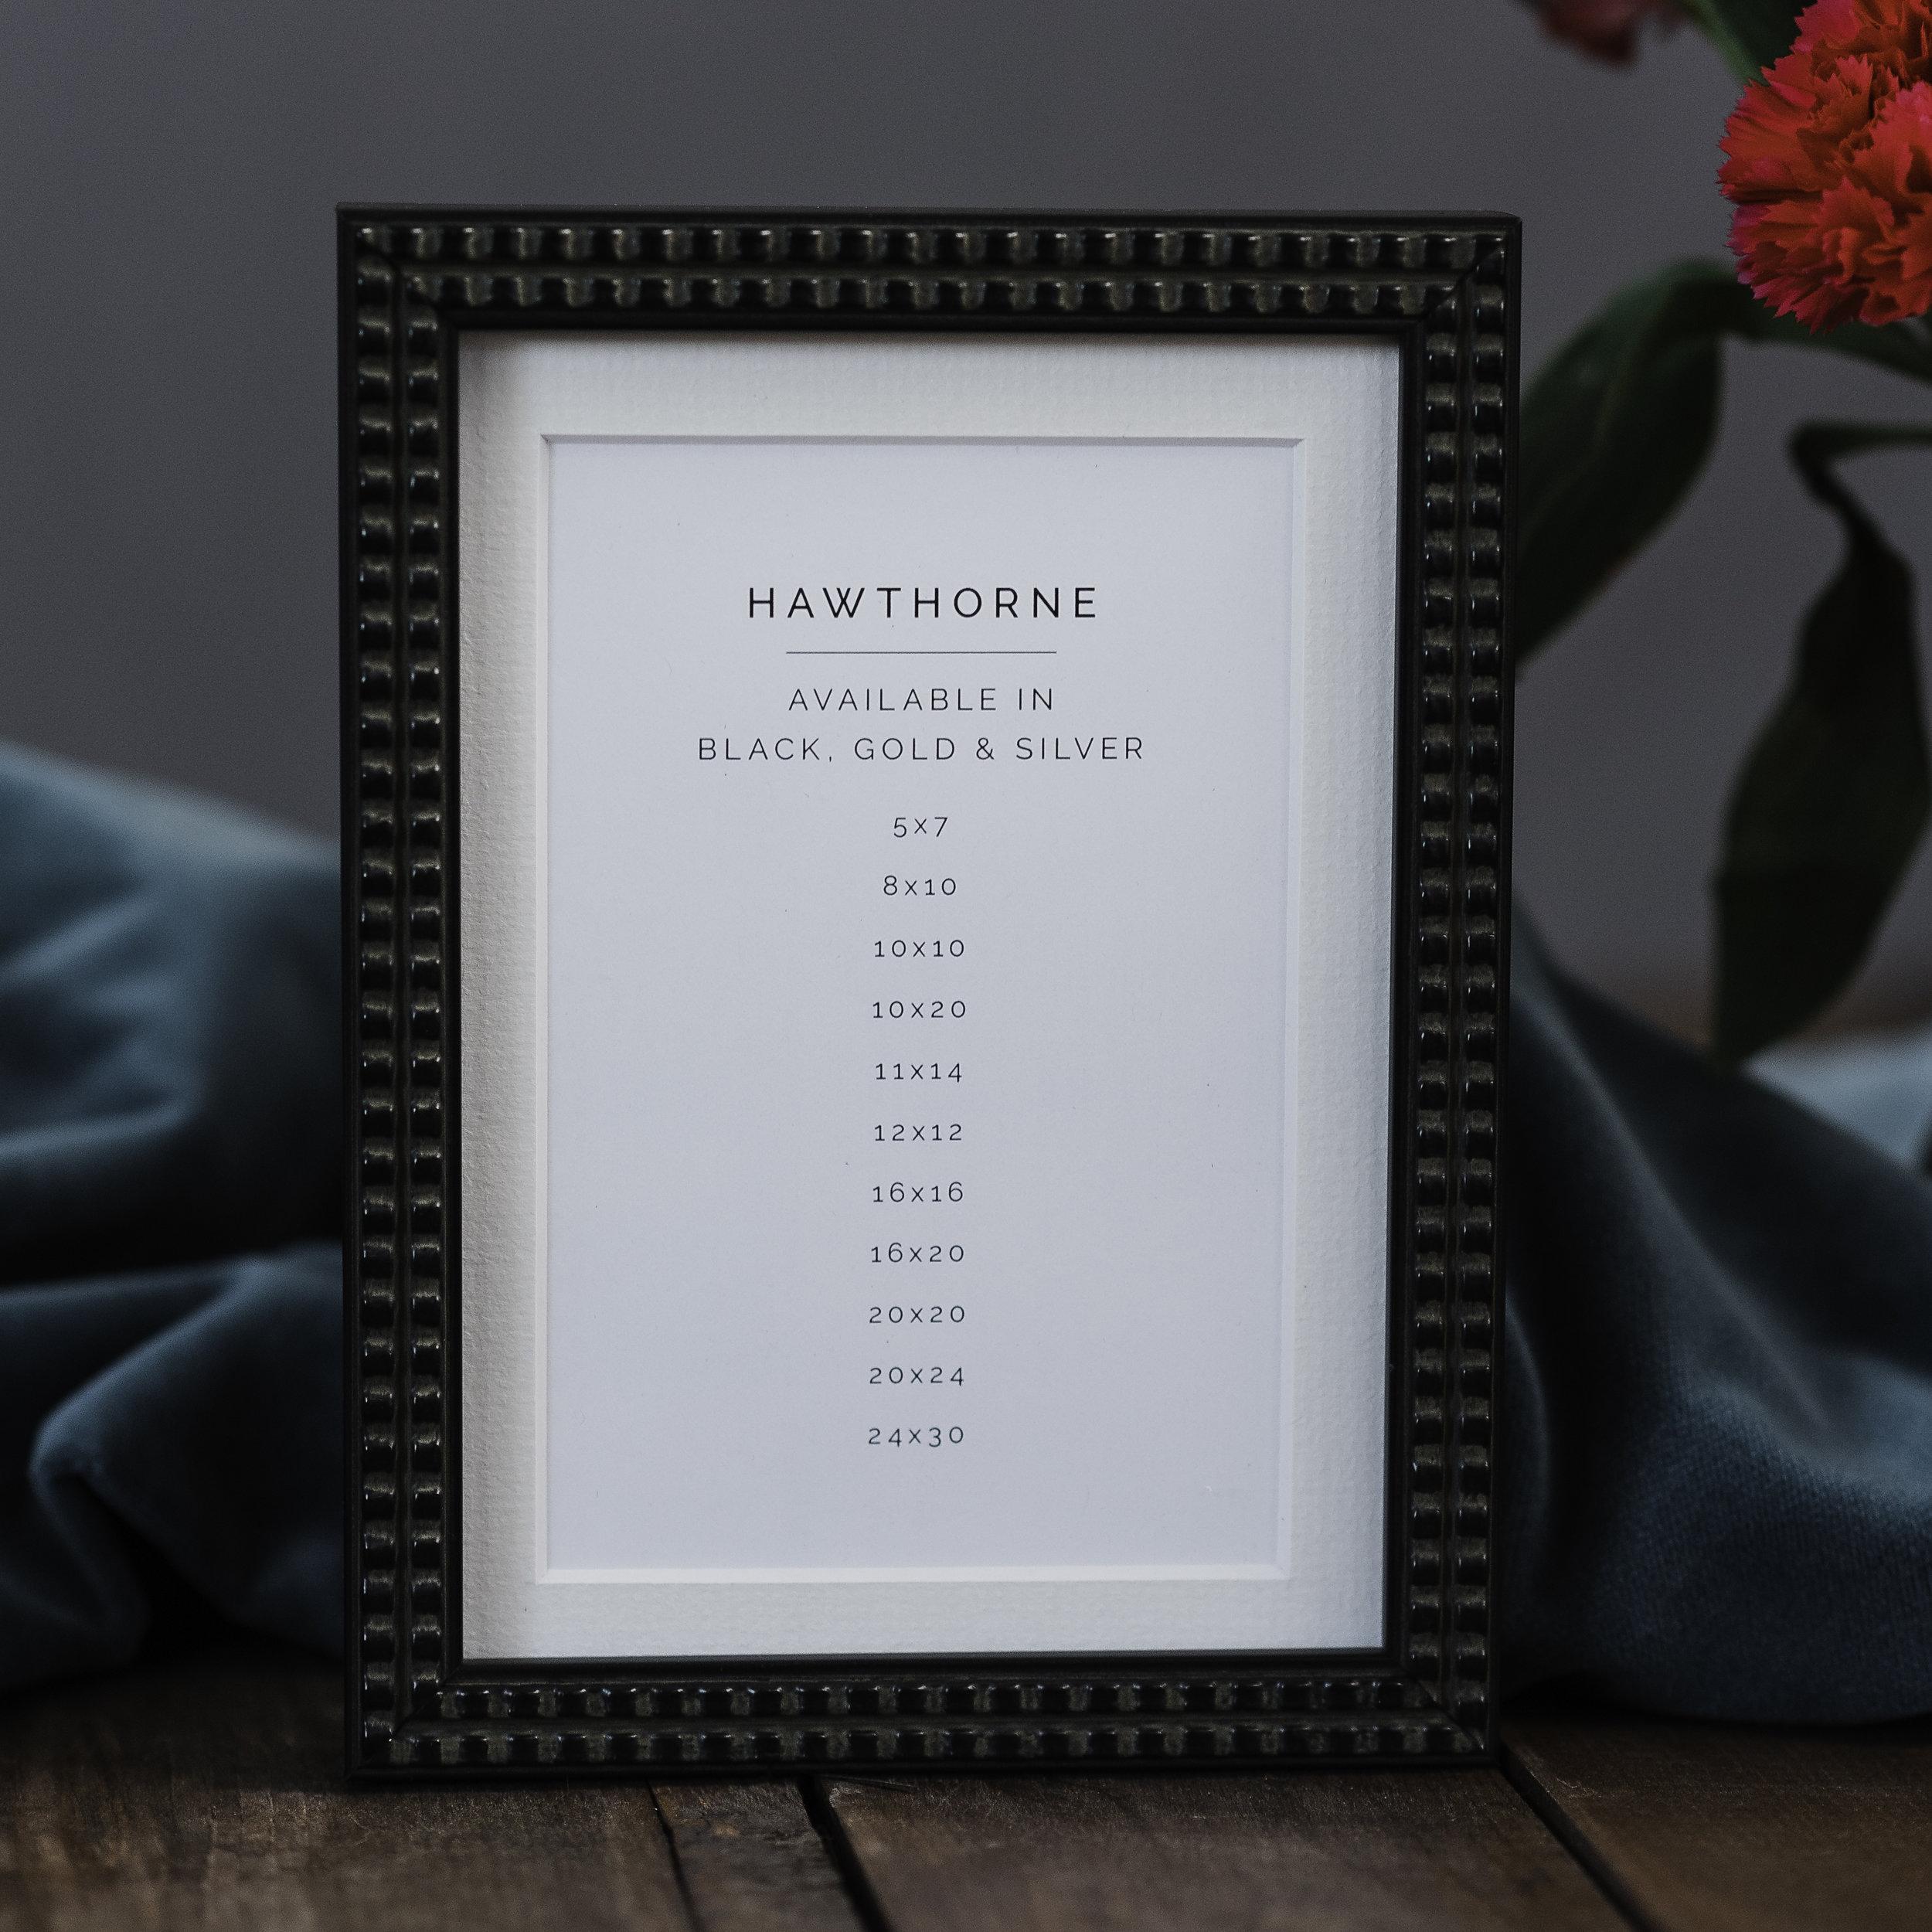 Black Hawthorne Frame